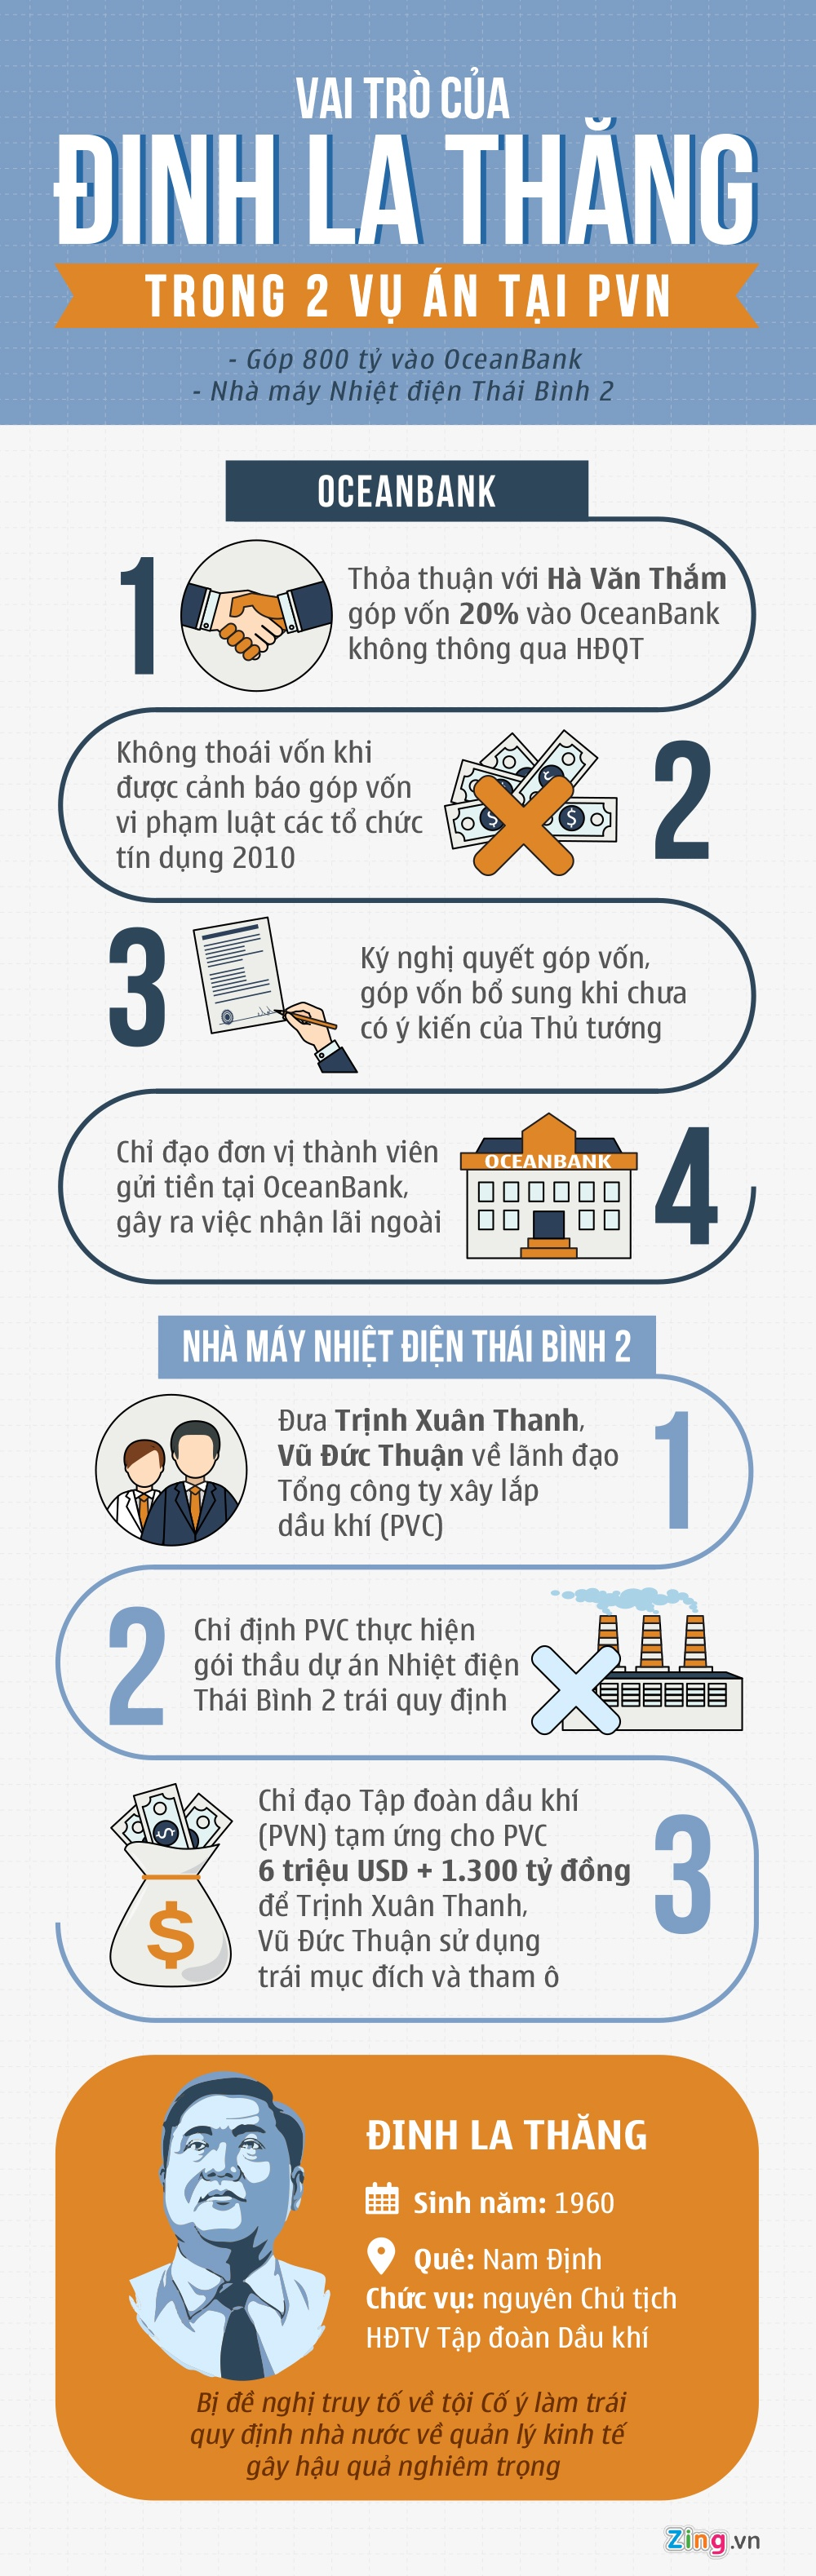 Vai tro cua Dinh La Thang trong 2 vu dai an anh 1